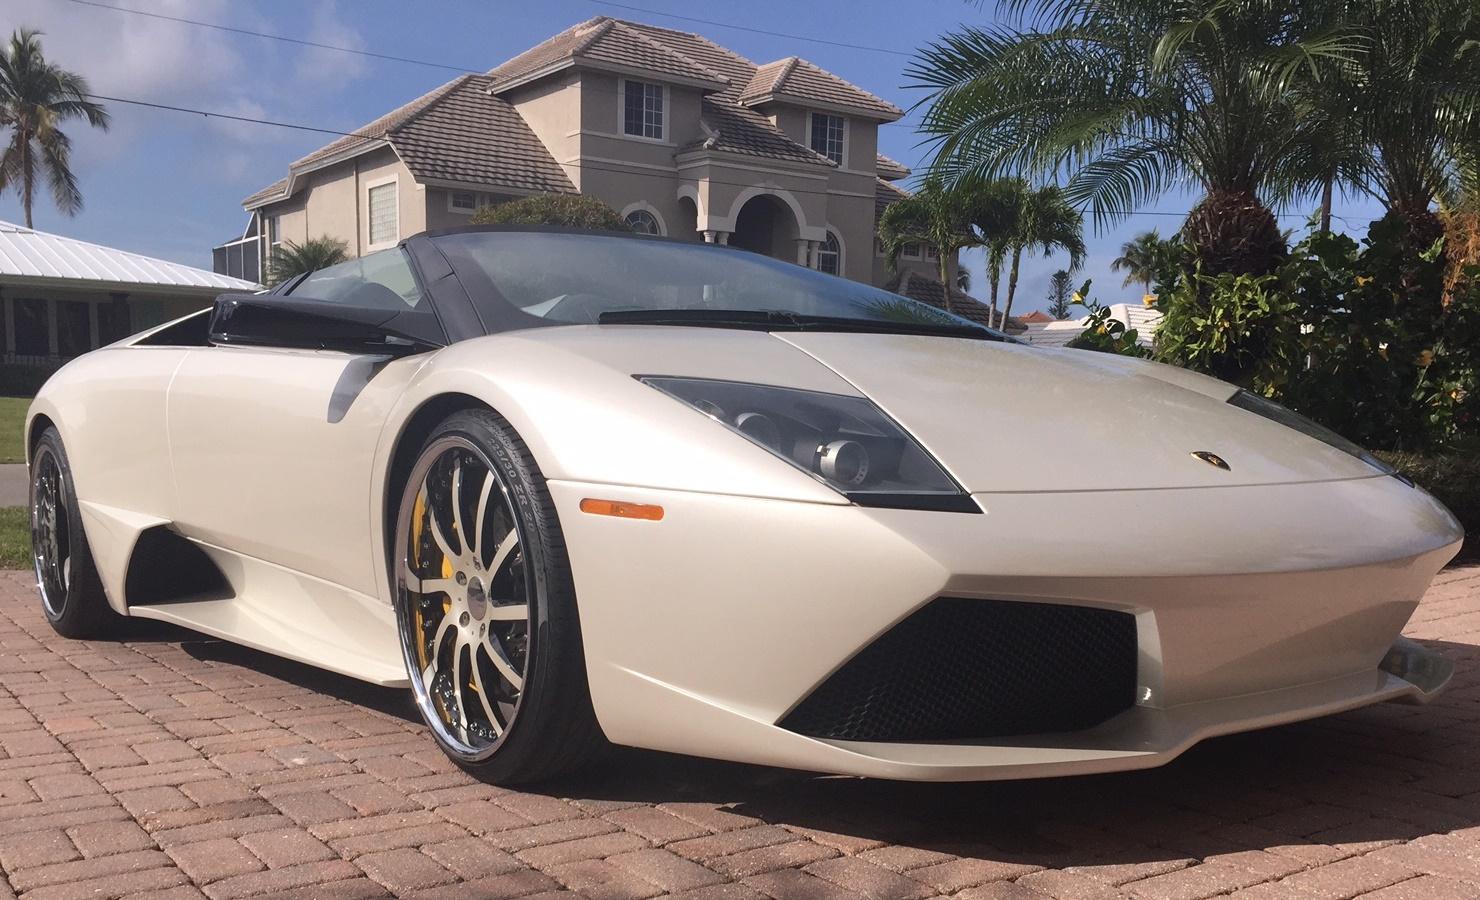 2008 Lamborghini Murcielago Lp640 Roadster Sold Exotic Car Search